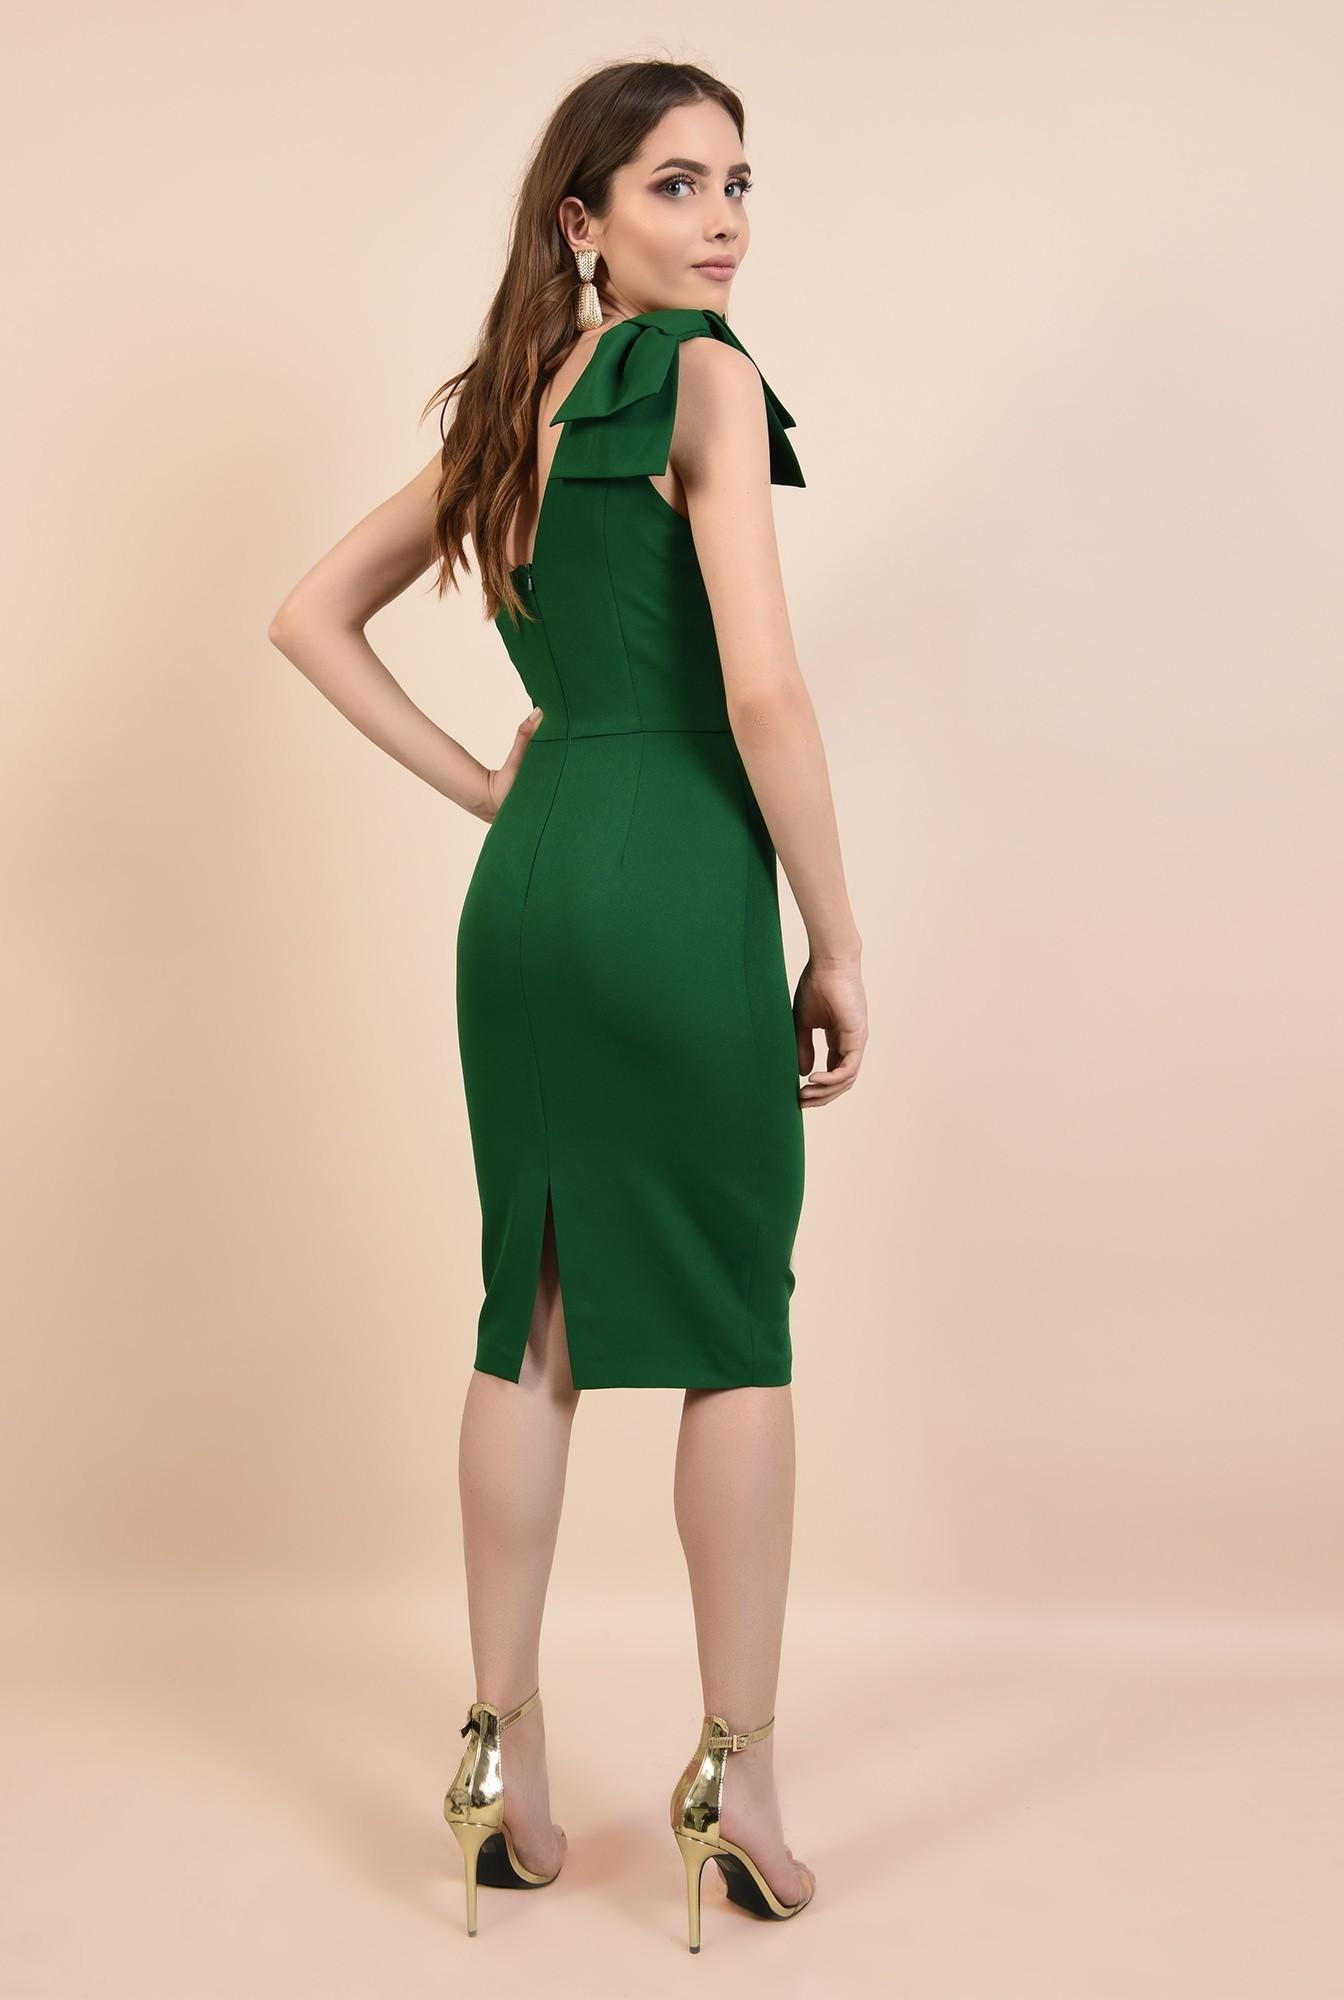 1 - rochie de ocazie, verde, clepsidra, funde la umar, rochii elegante online